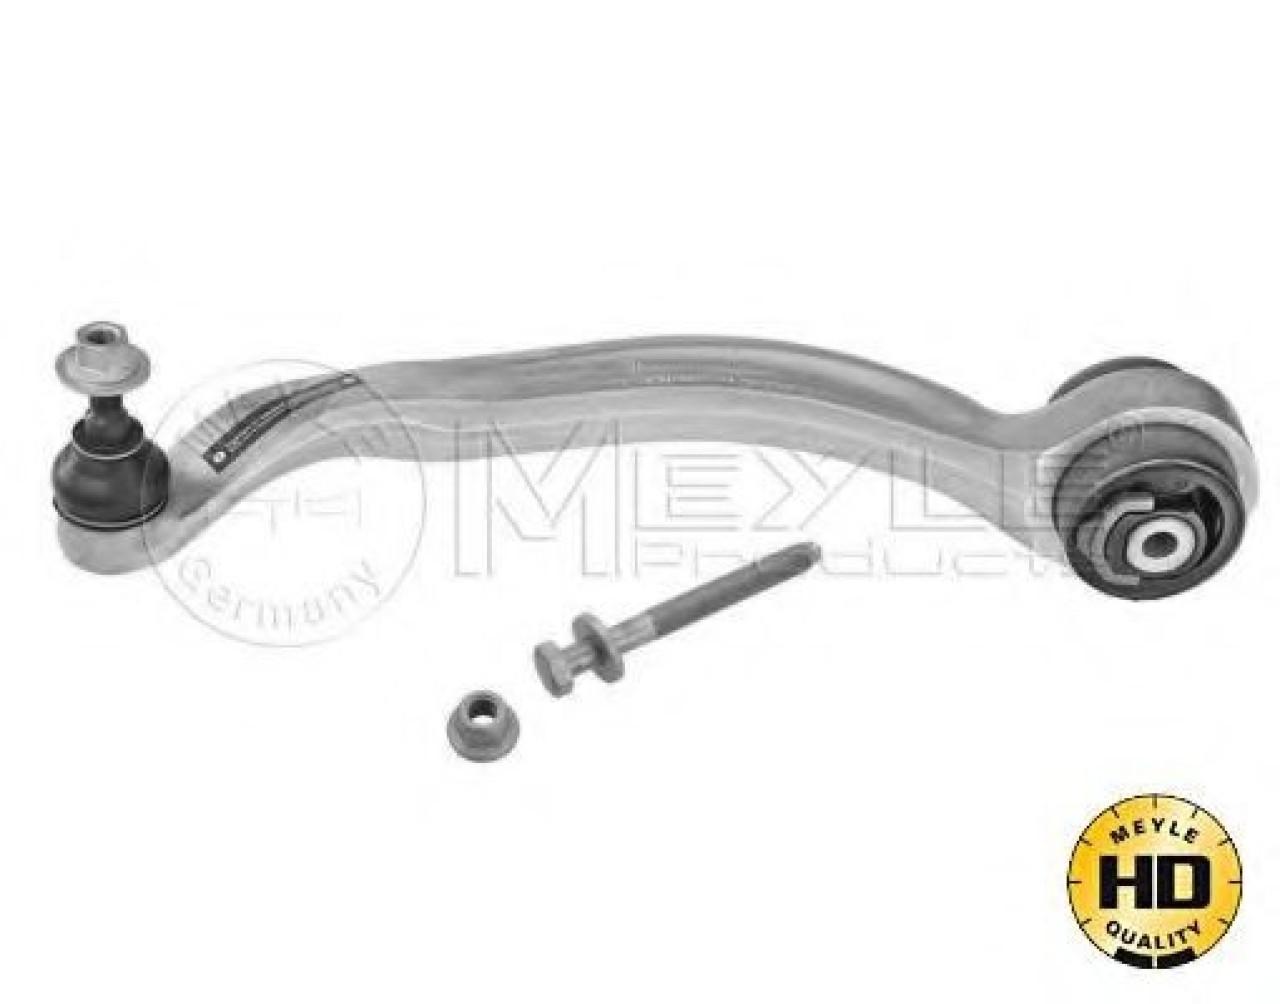 Bascula / Brat suspensie roata AUDI A4 Avant (8ED, B7) (2004 - 2008) MEYLE 116 050 8299/HD produs NOU